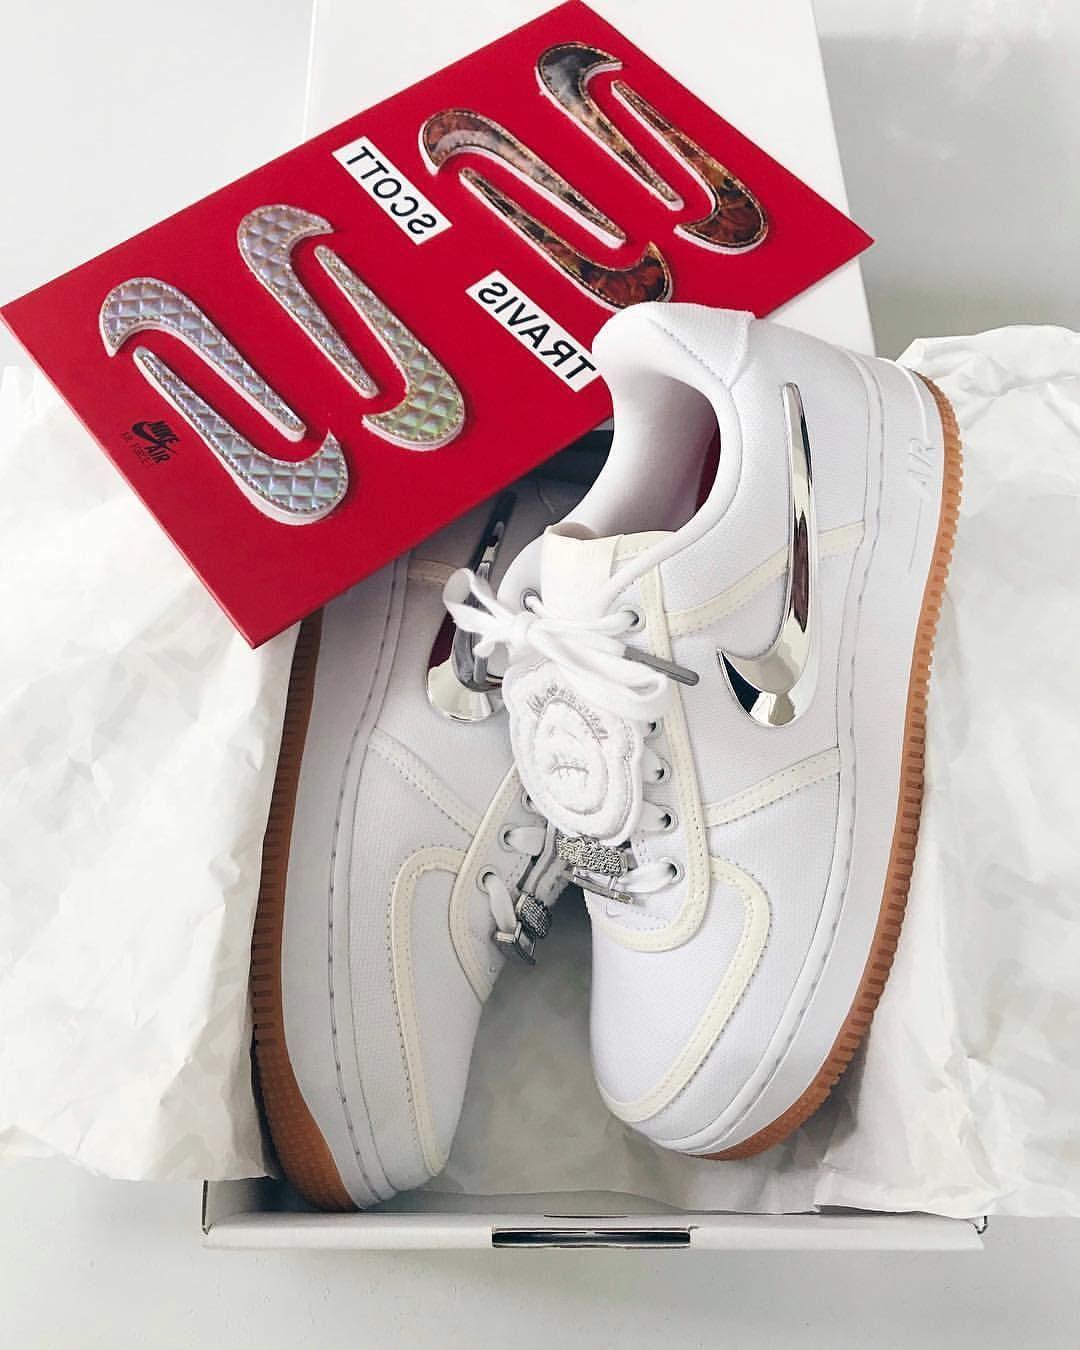 Nike Air Force 1 Travis Scott Mens Shoes Size 10 AQ4211 101